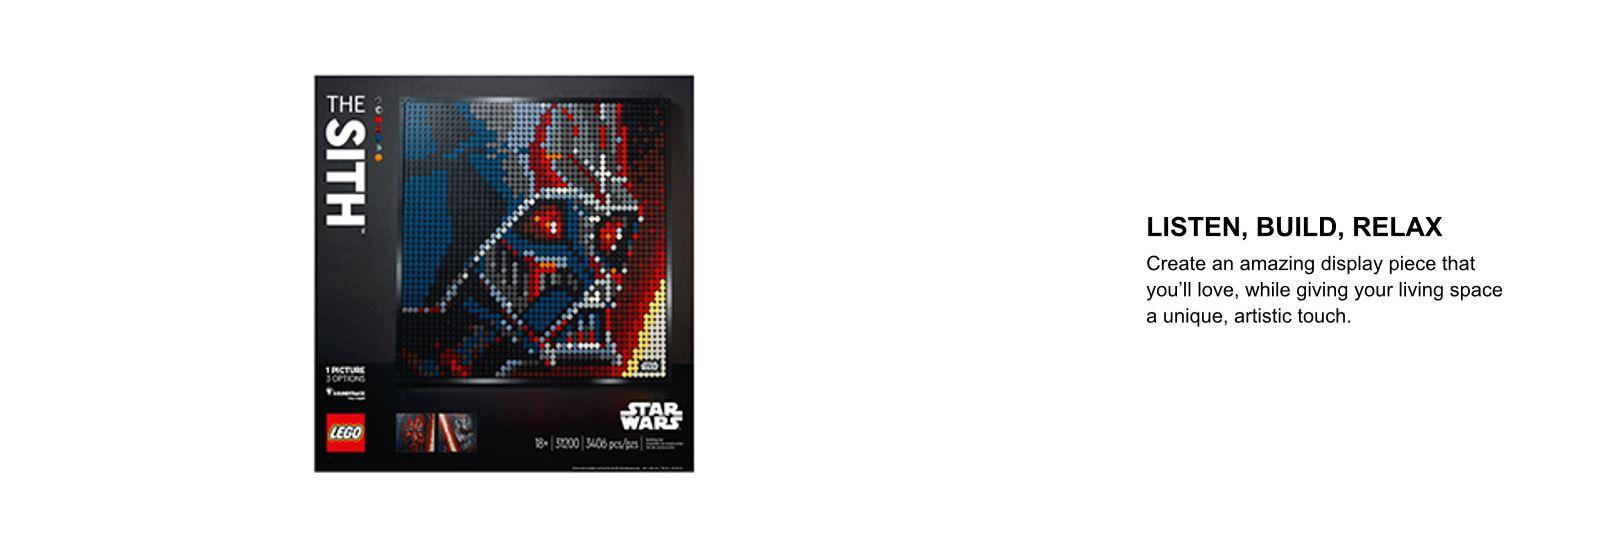 Star Wars wall piece